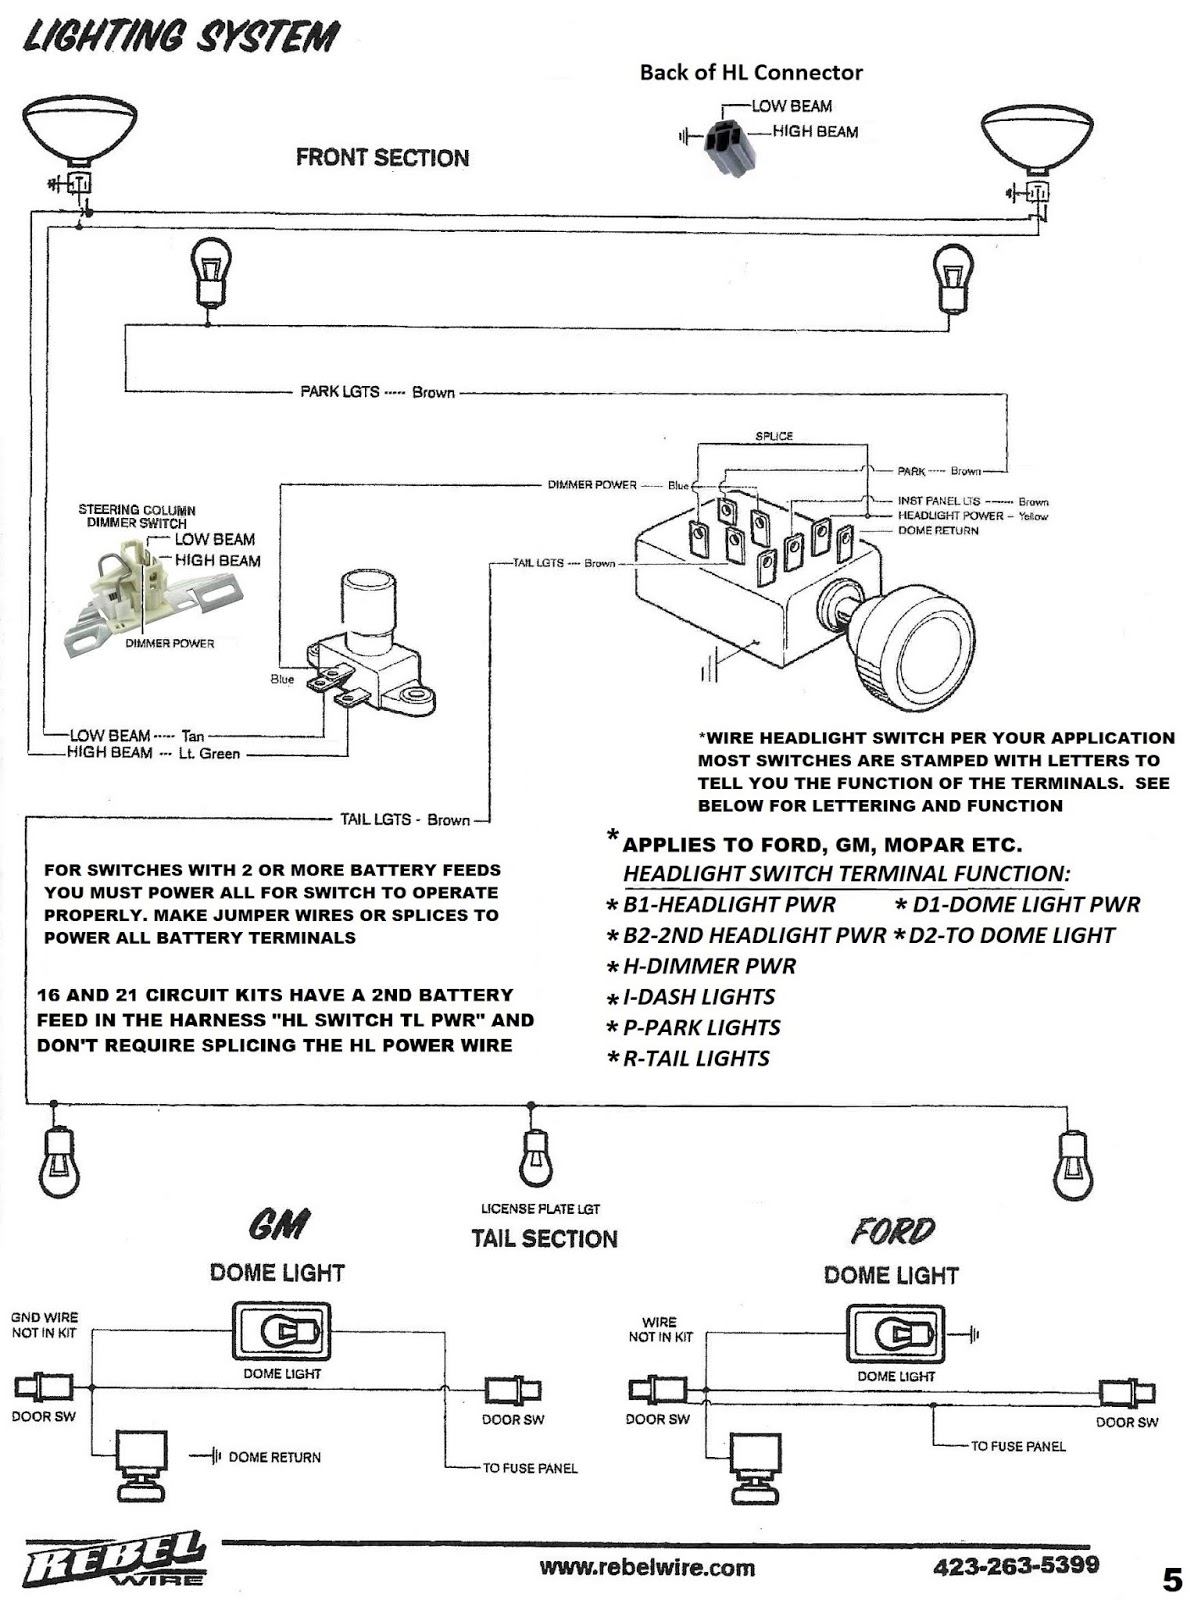 stewart warner gauges wiring diagrams hyperion planning architecture diagram sw freebootstrapthemes co